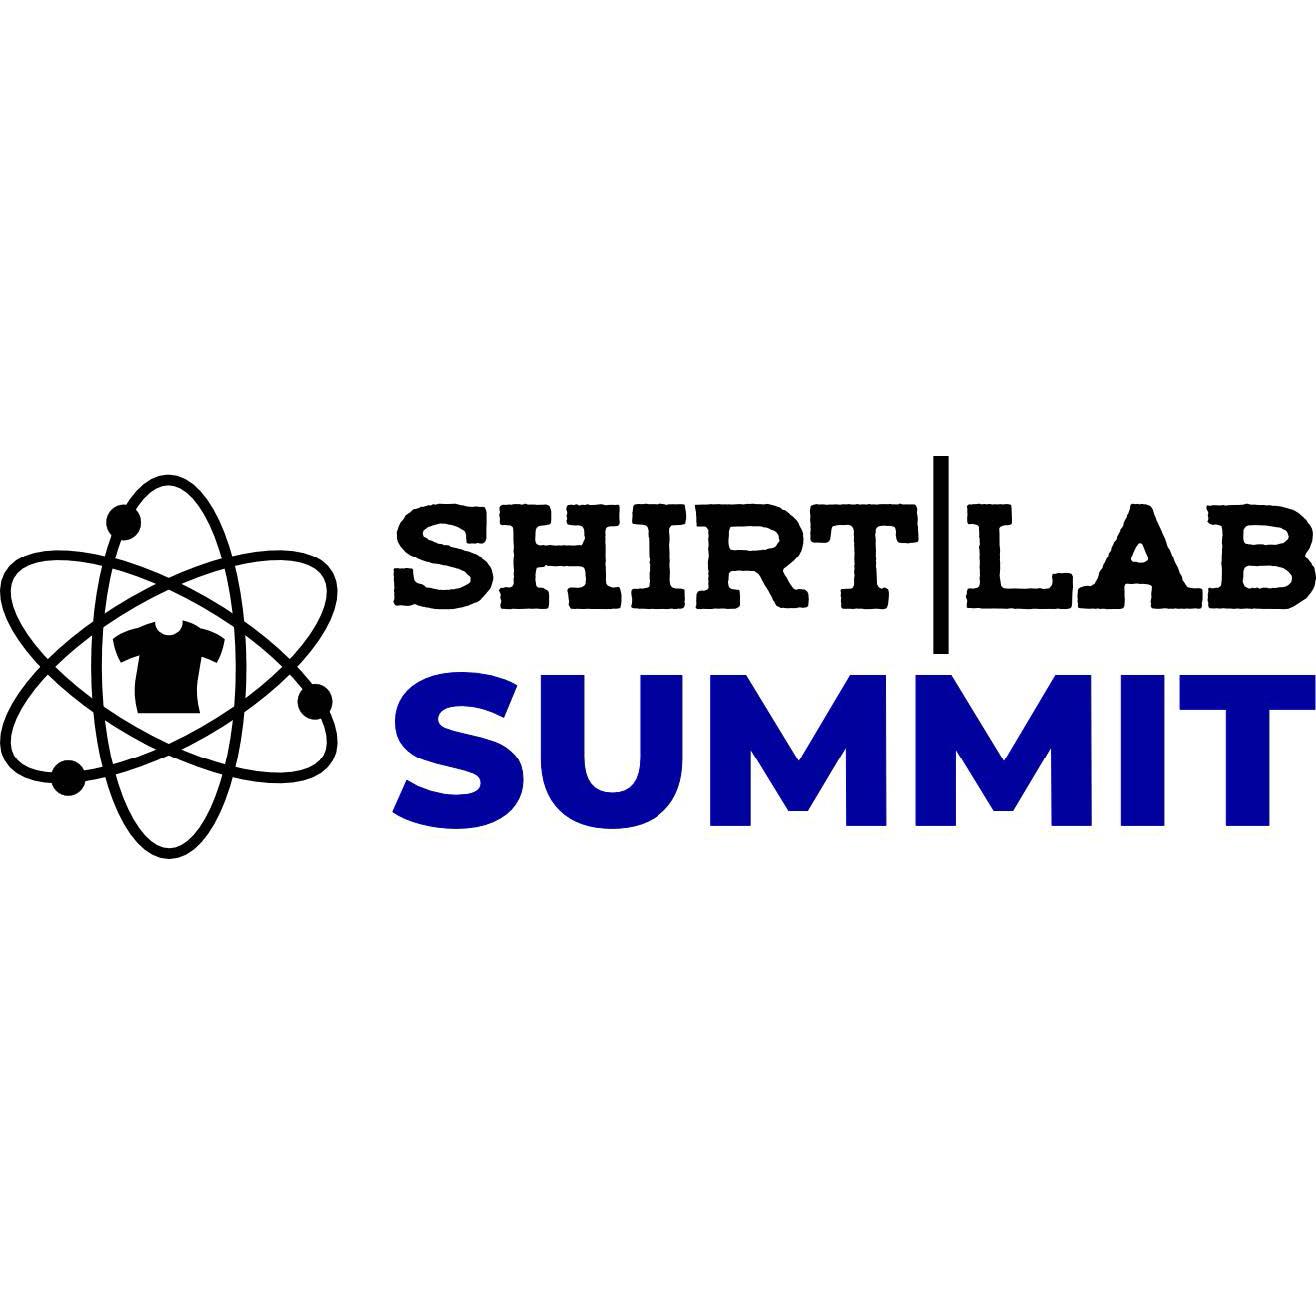 Shirt Lab Summit 2020